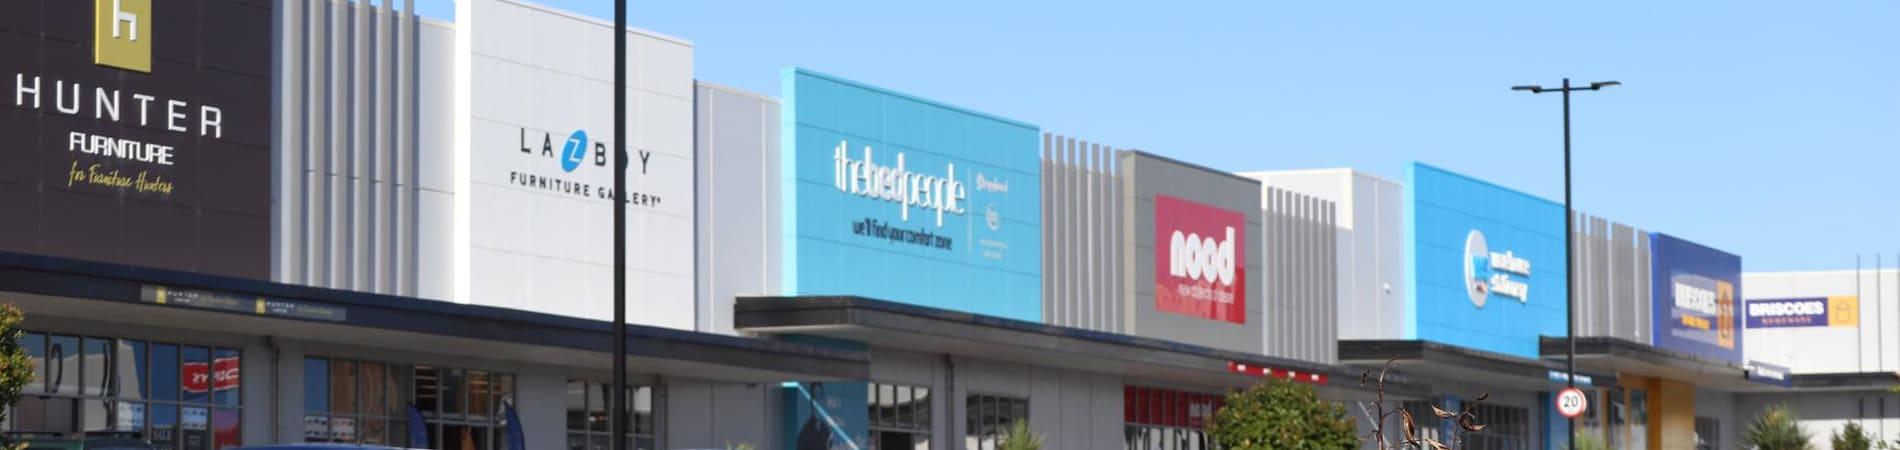 Westgate Lifestyle Centre banner - Westgate Lifestyle Centre